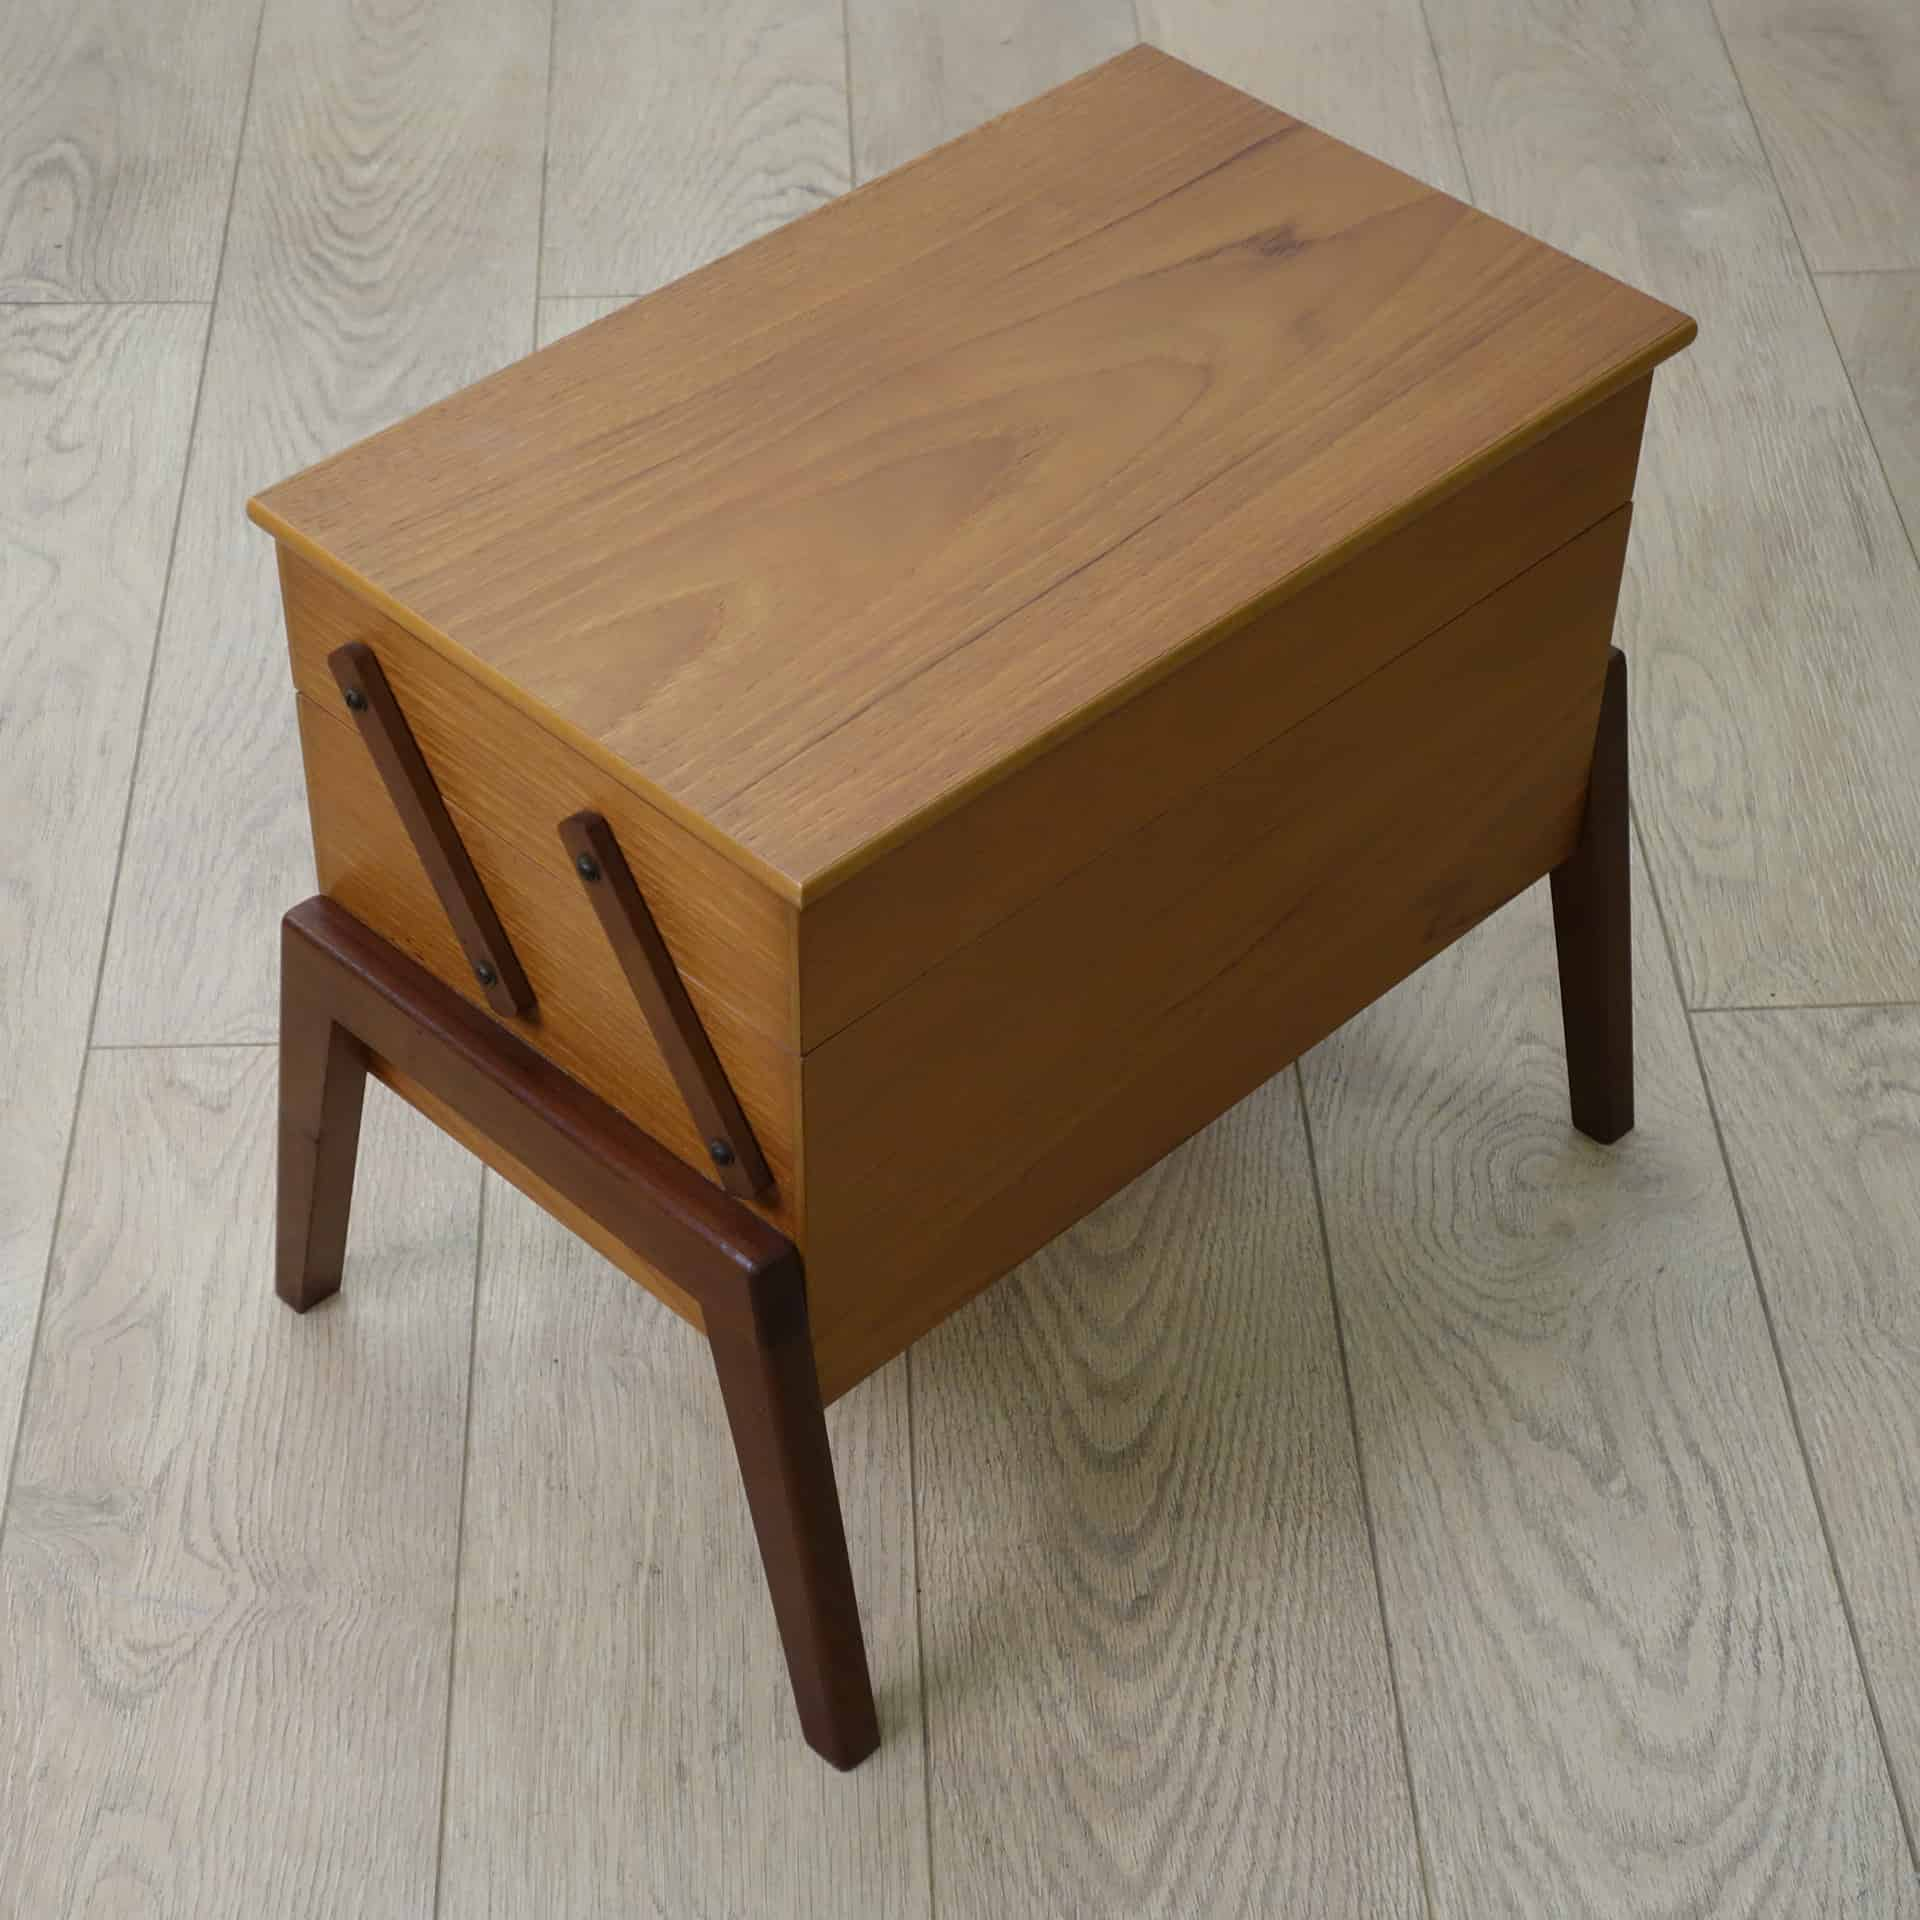 1960s teak sewing box